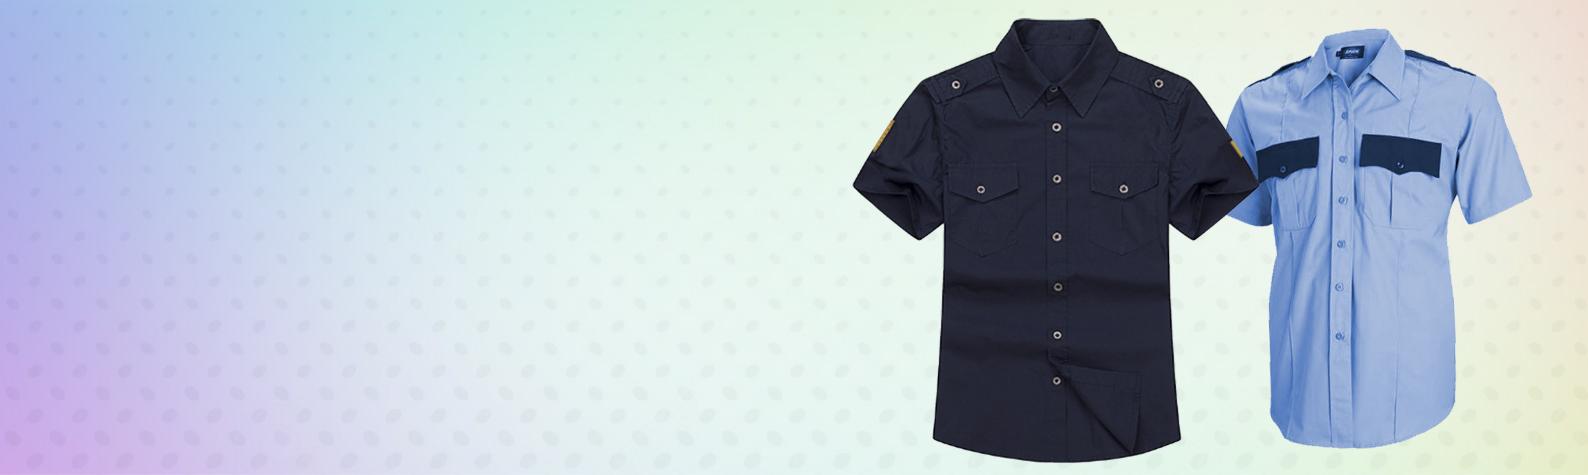 Security Services Uniforms